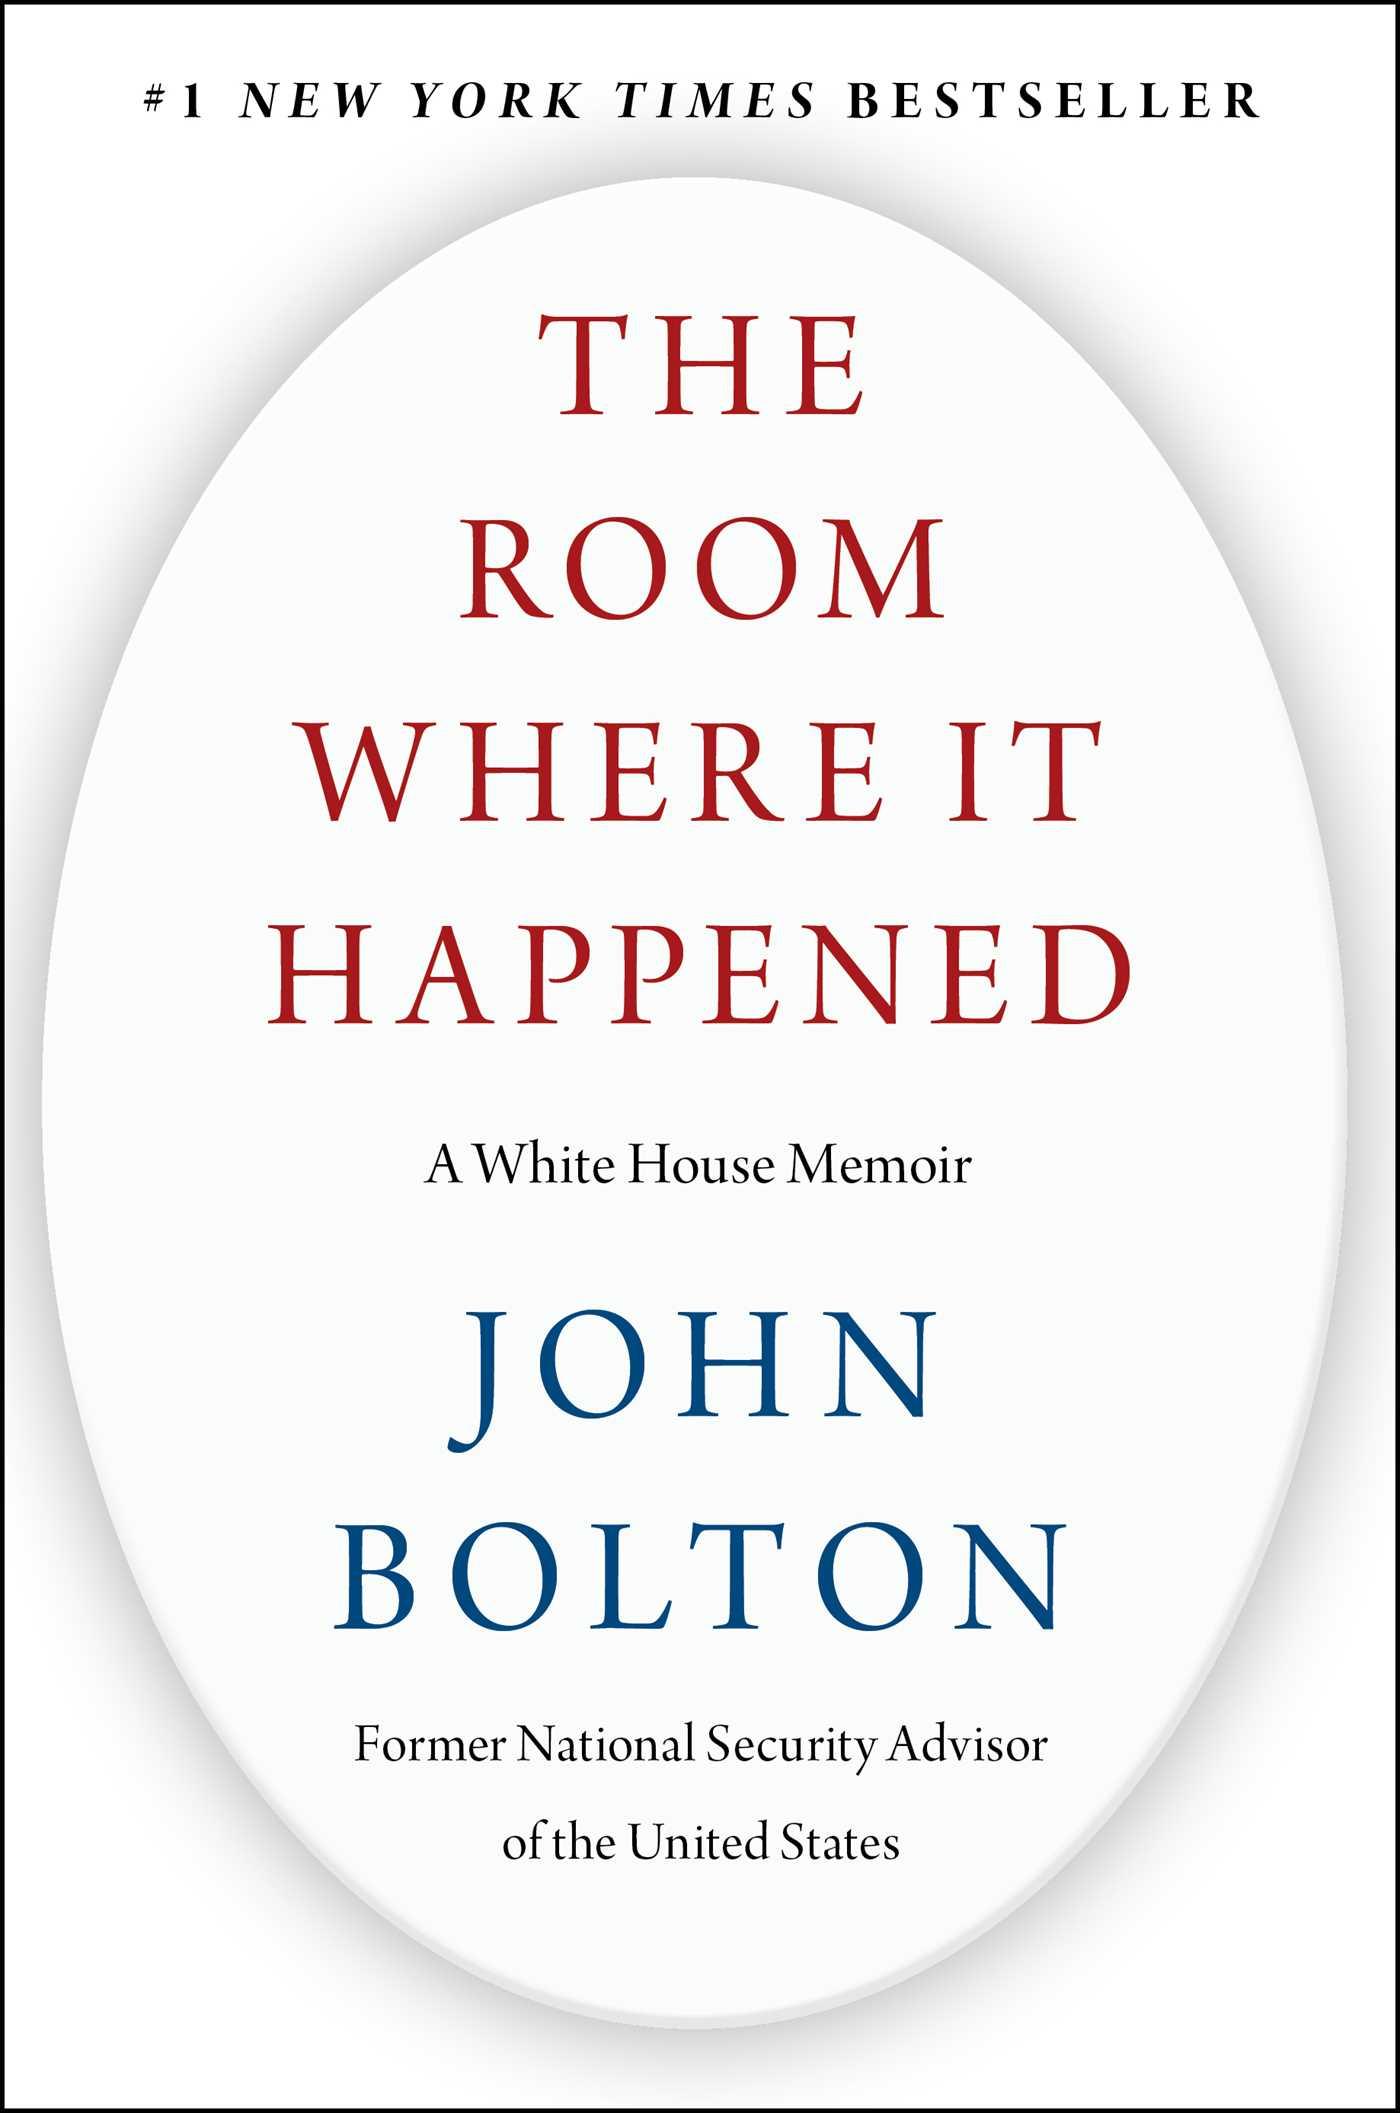 Livro de John Bolton